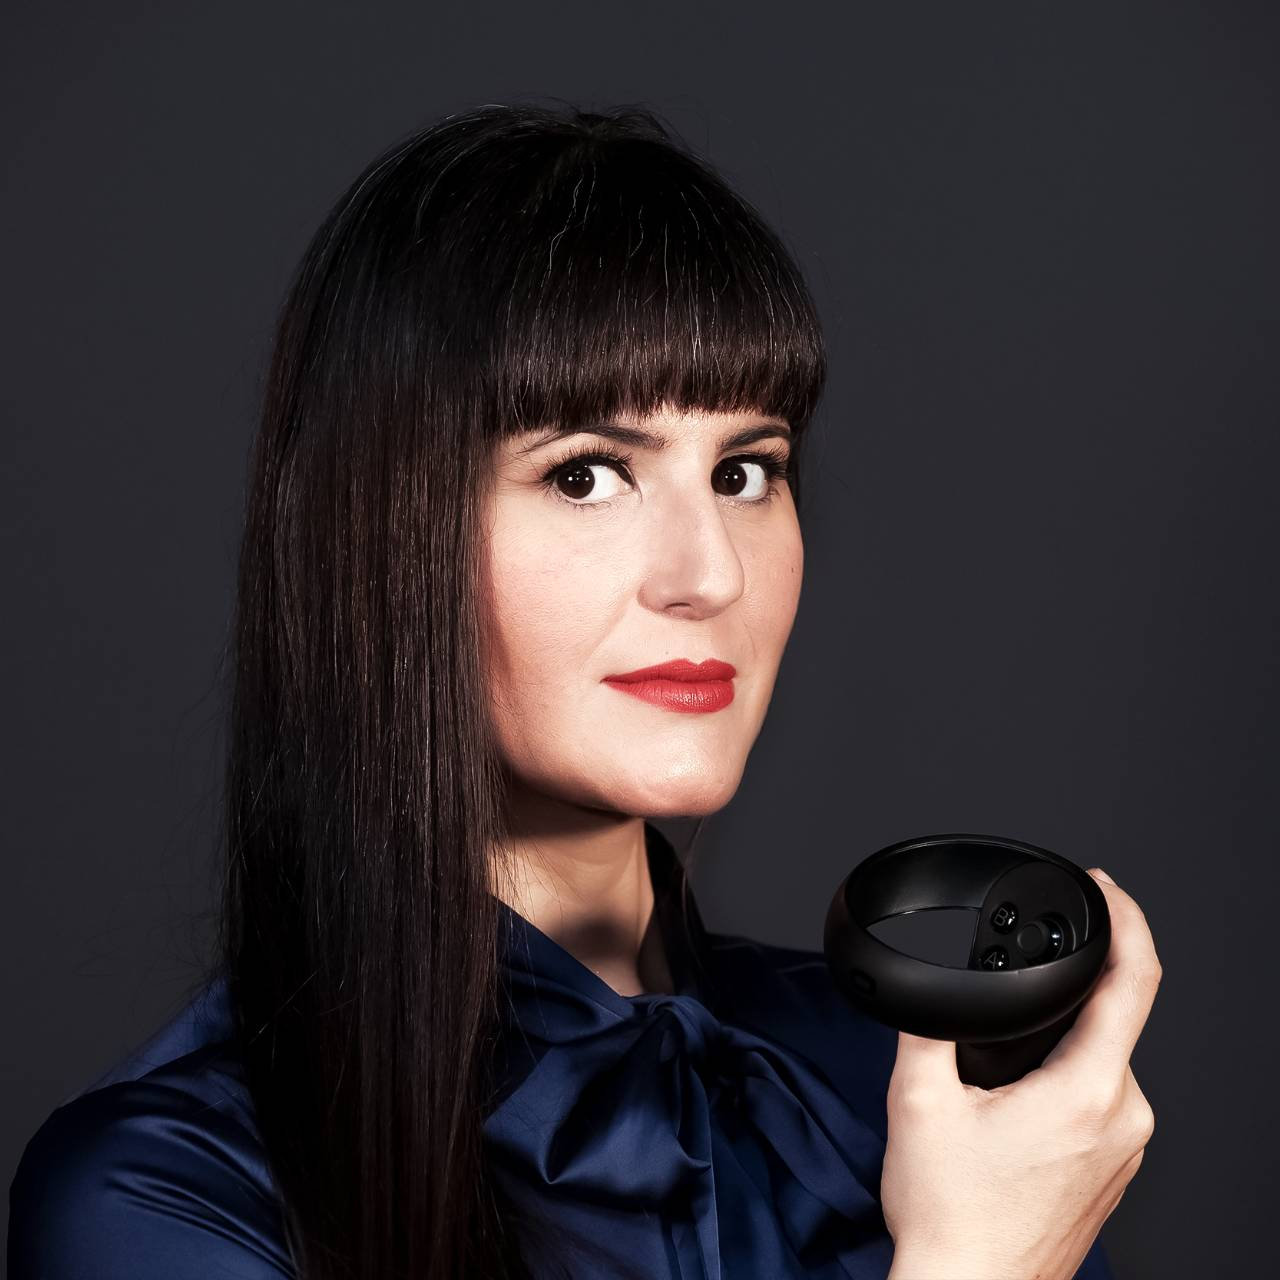 Gabriella Chihan